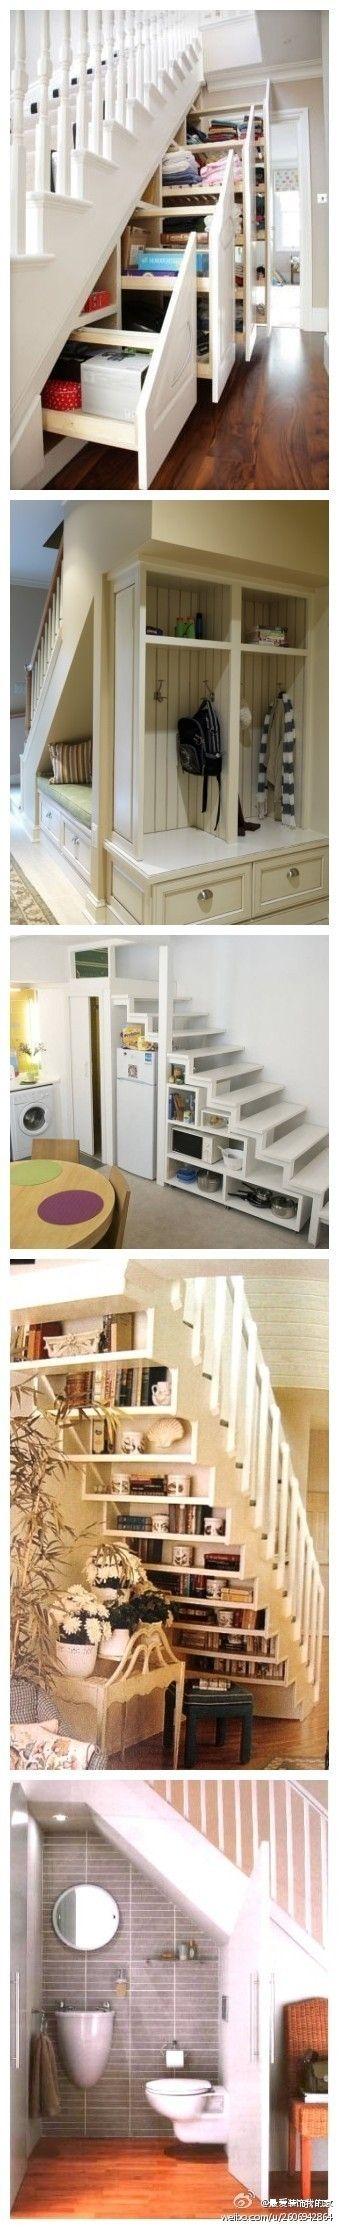 storage by lenora